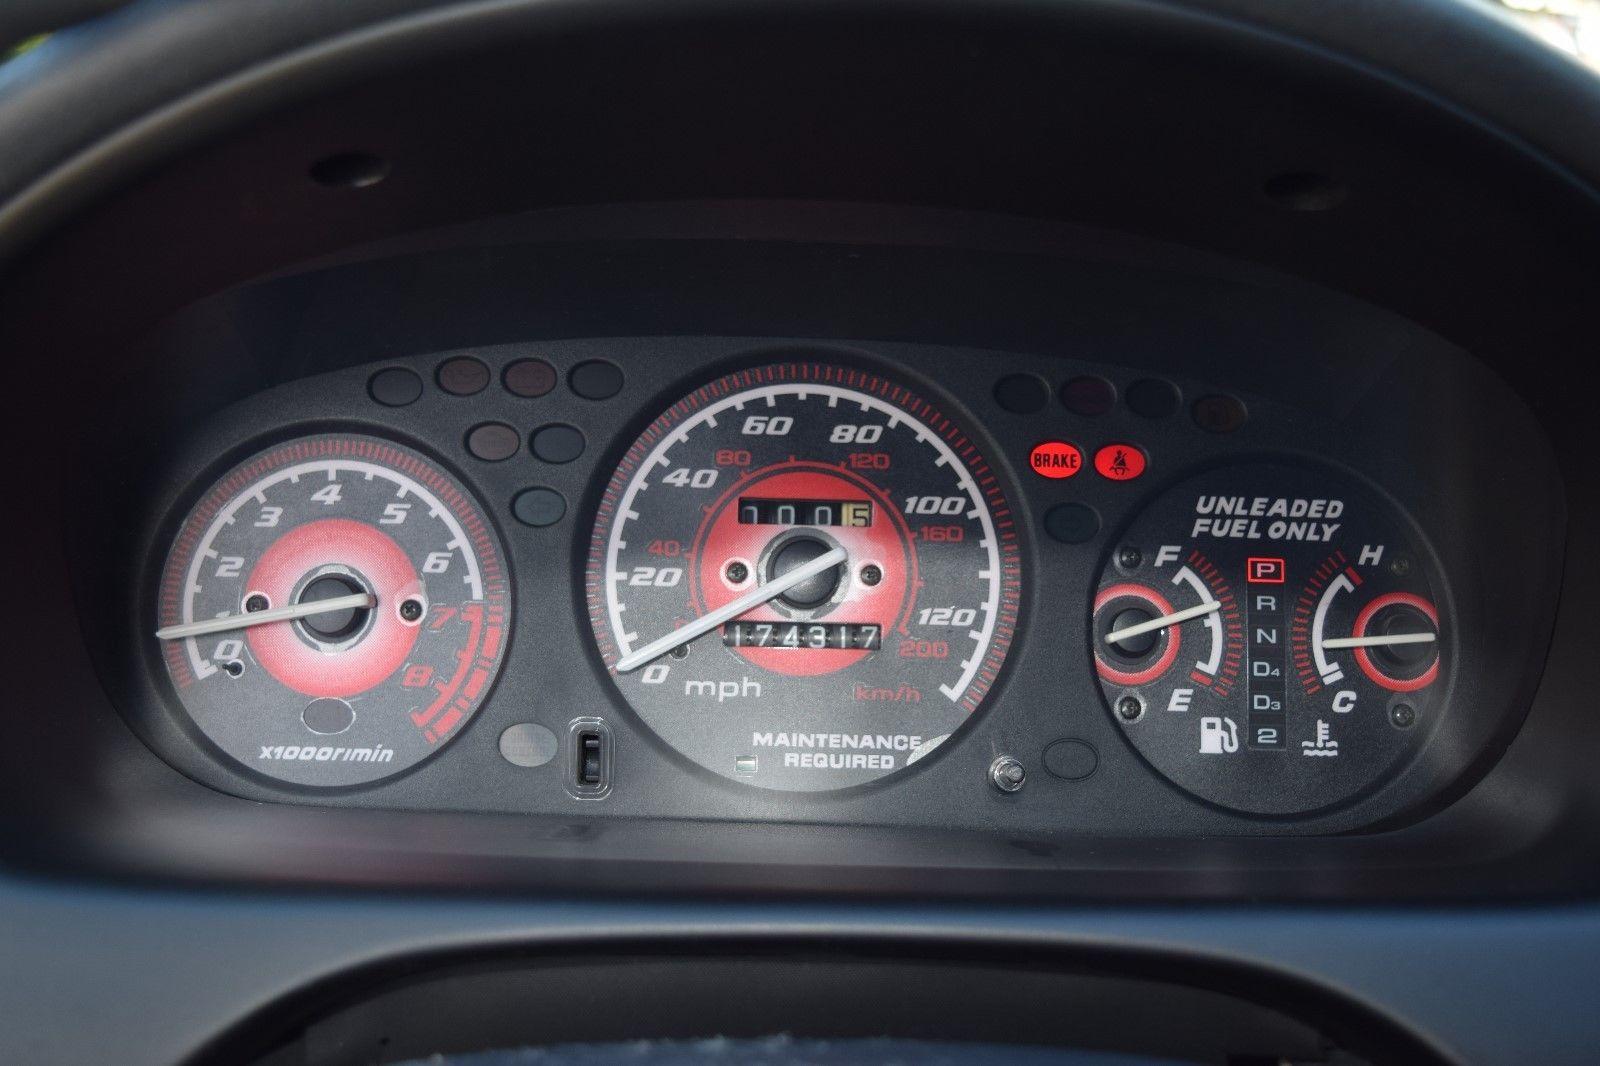 Amazing 1996 Honda Civic Hatchback Type Fuel Gauge Item Specifics